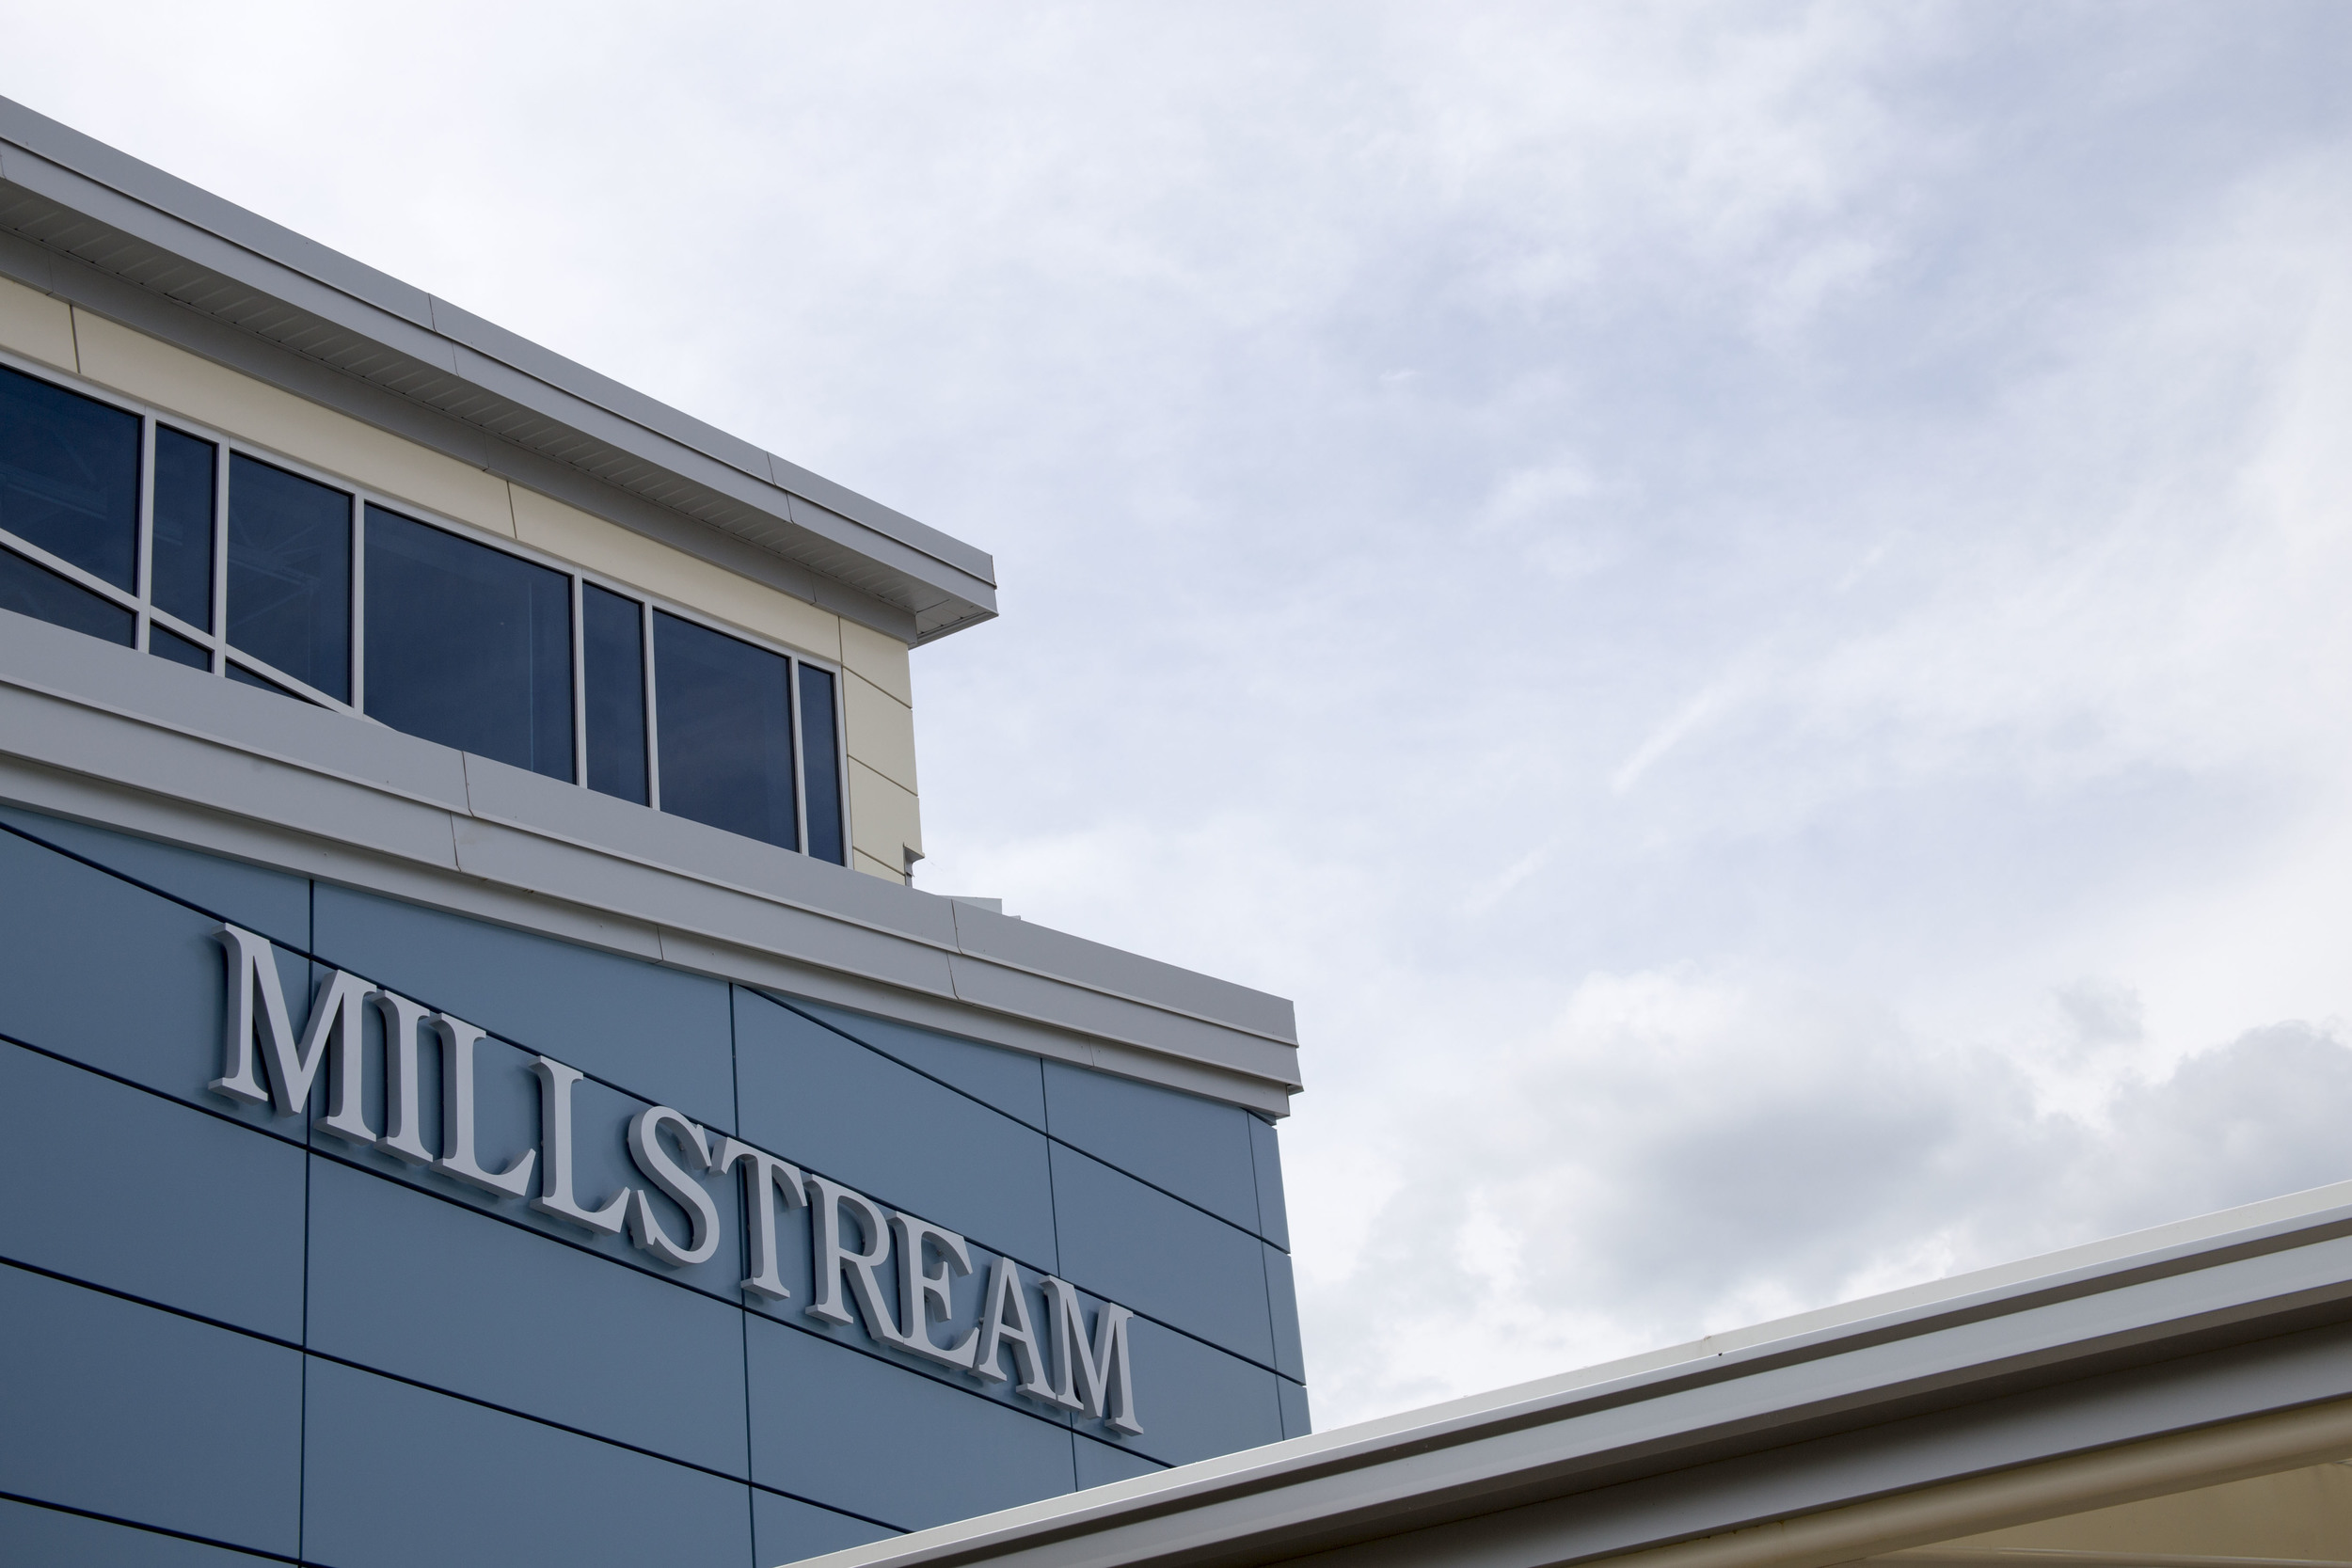 www.rcmarchitects.com - findlay city schools: millstream career center (3)